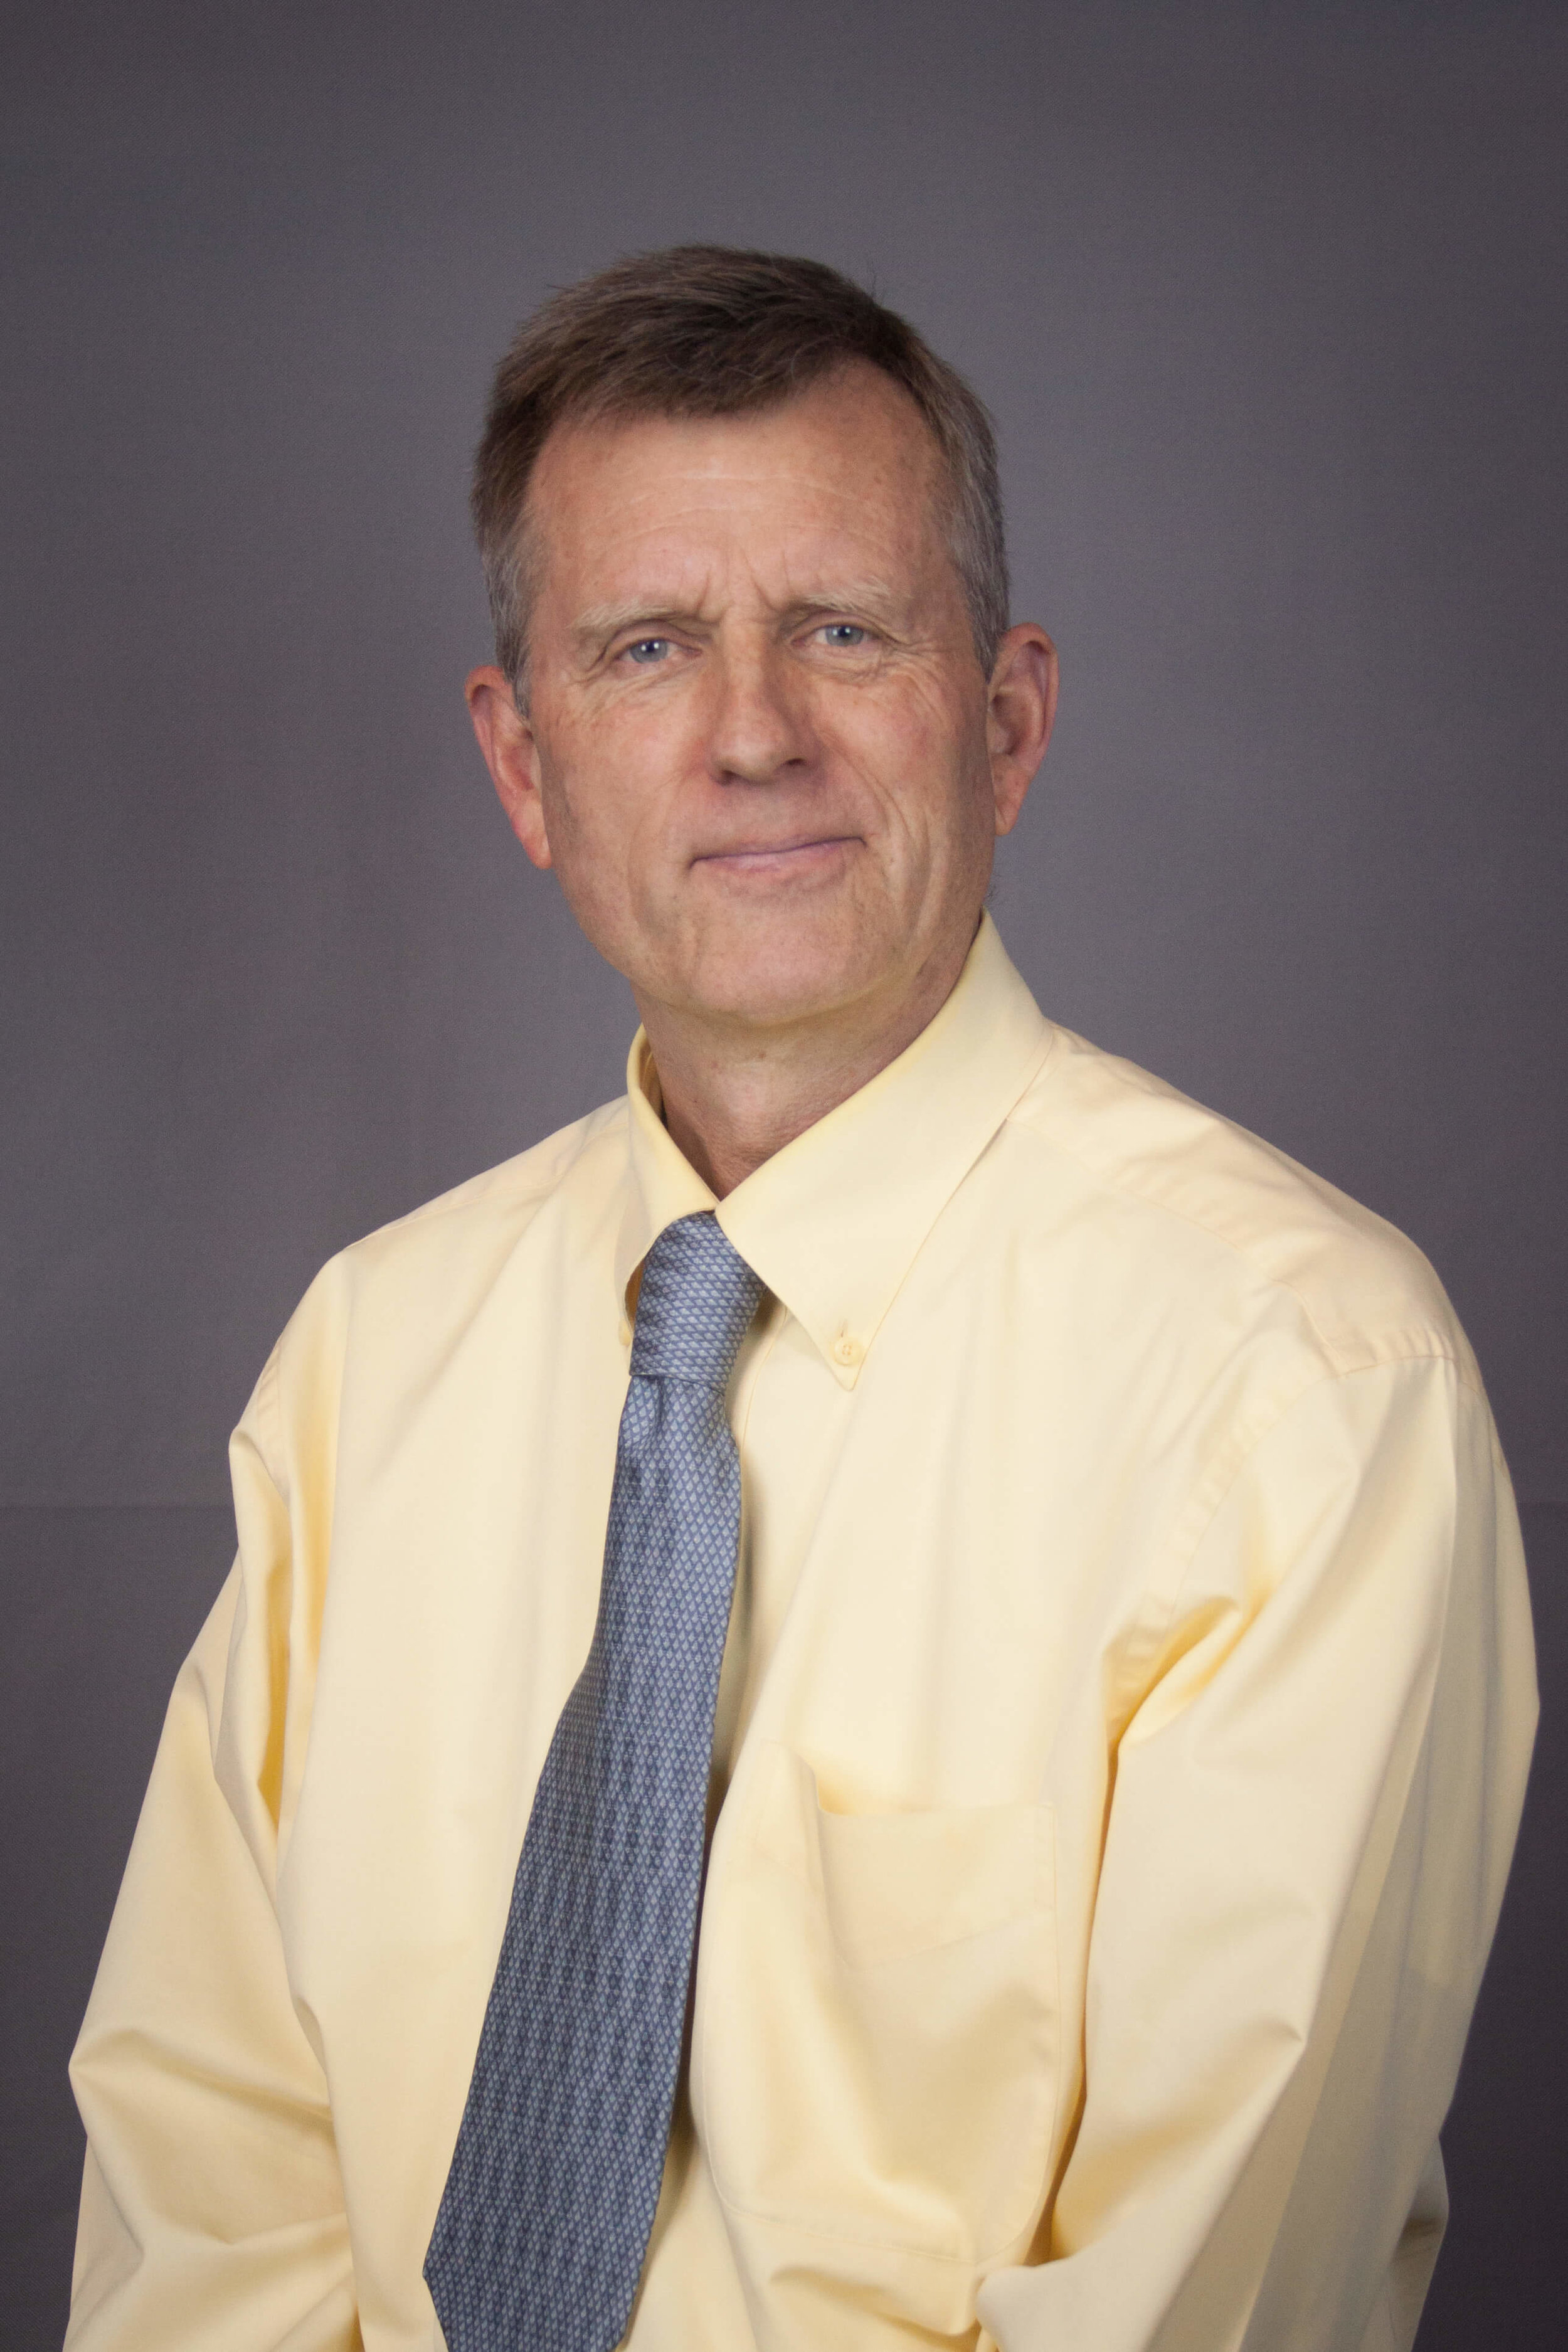 Robert Danielson.  financeteam@crosspointadventist.com   Treasurer